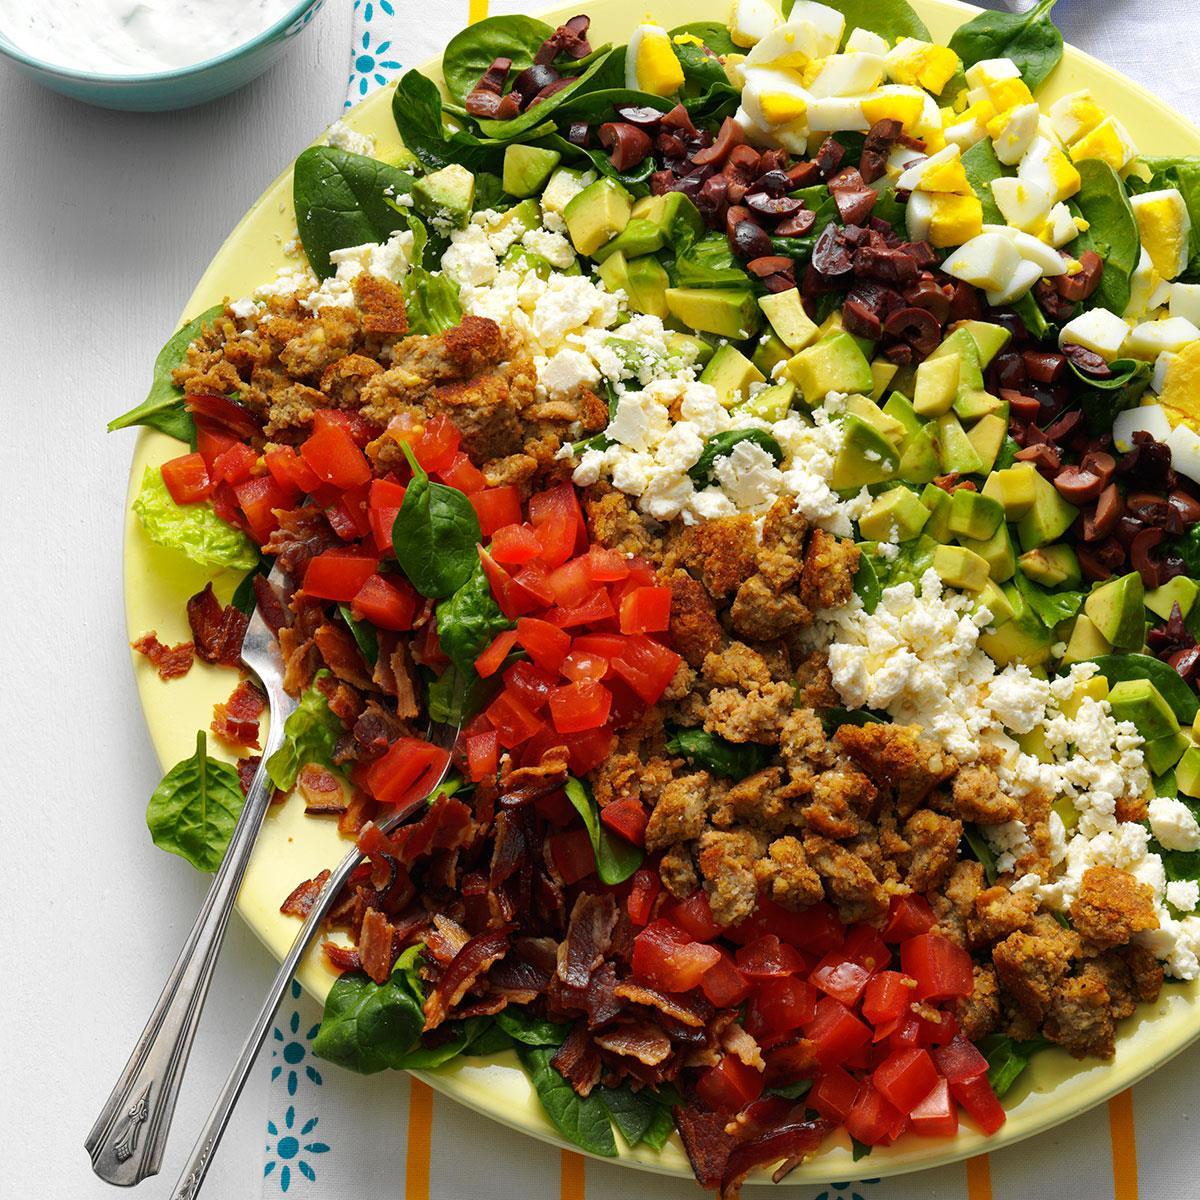 Mediterranean Style Recipes: Mediterranean Cobb Salad Recipe